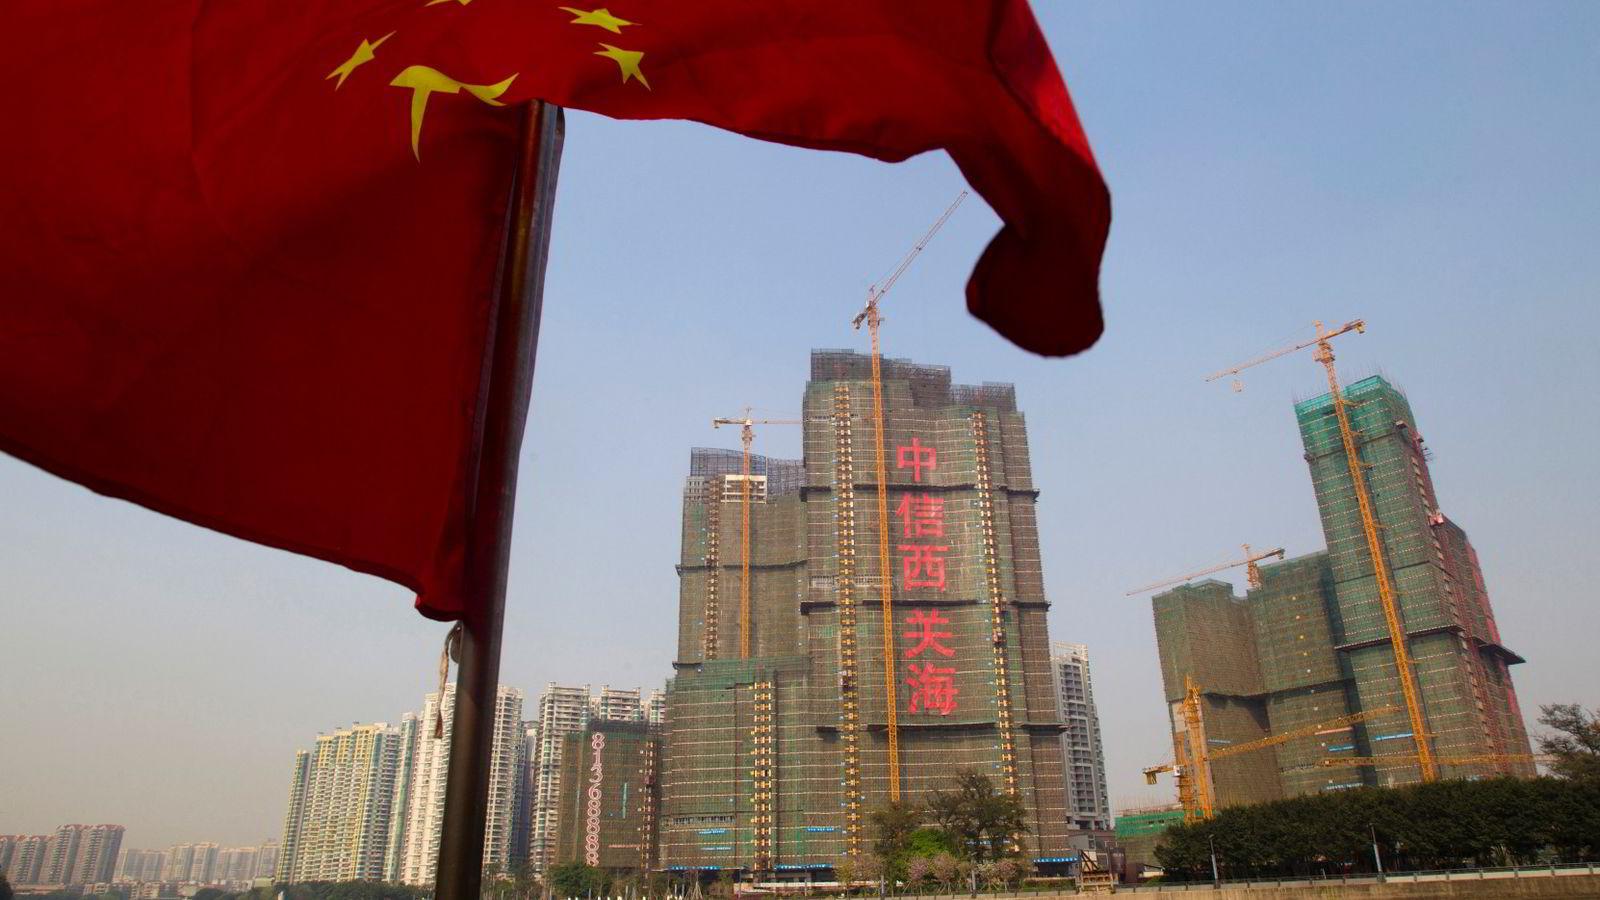 KINA: Bygninger anlegg Kina Skyskrapere i Guangzhou.